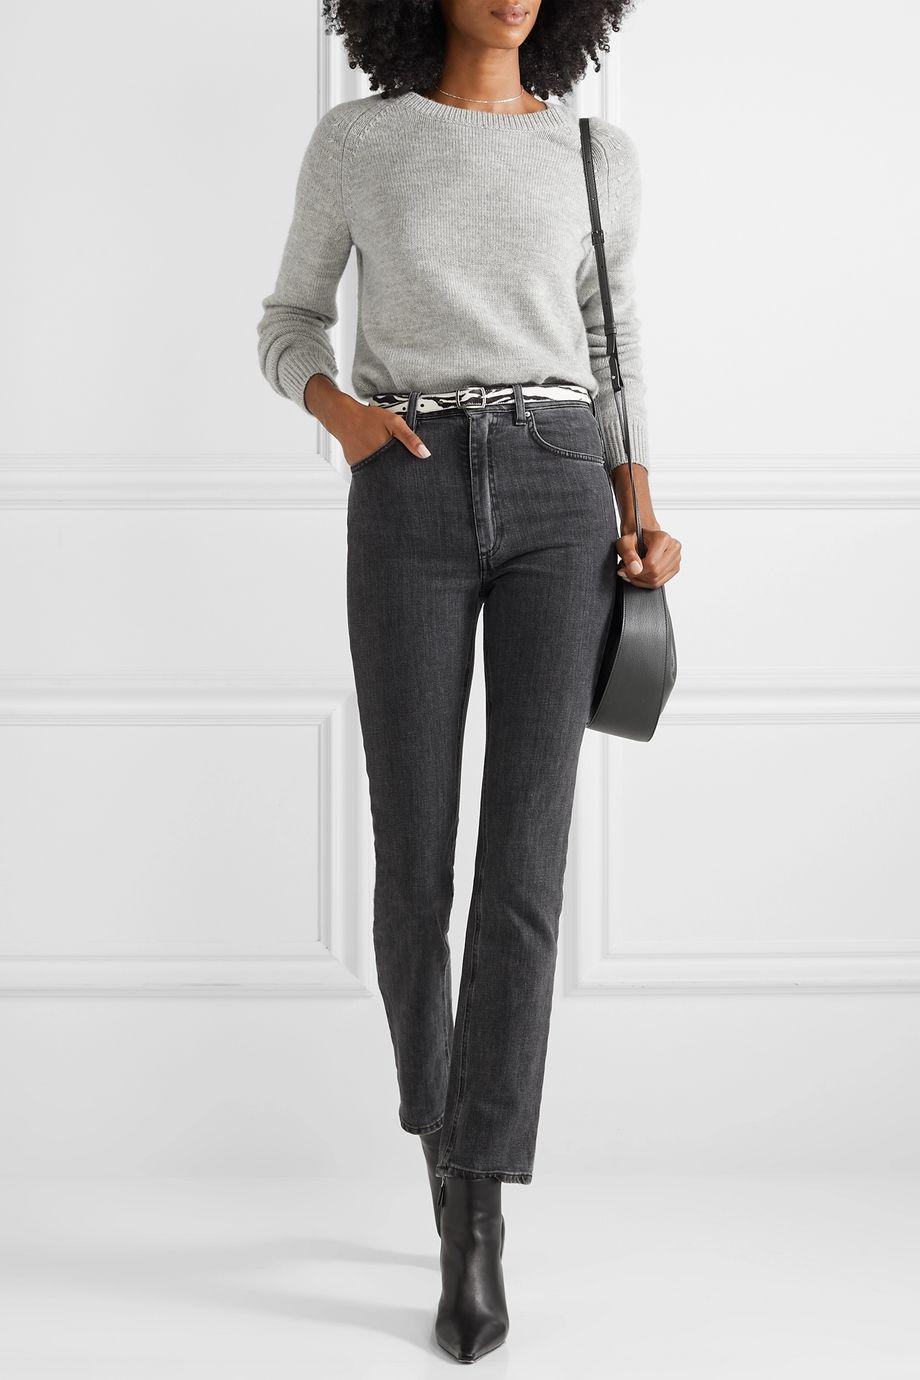 Nili Lotan Vesey merino wool and alpaca-blend sweater